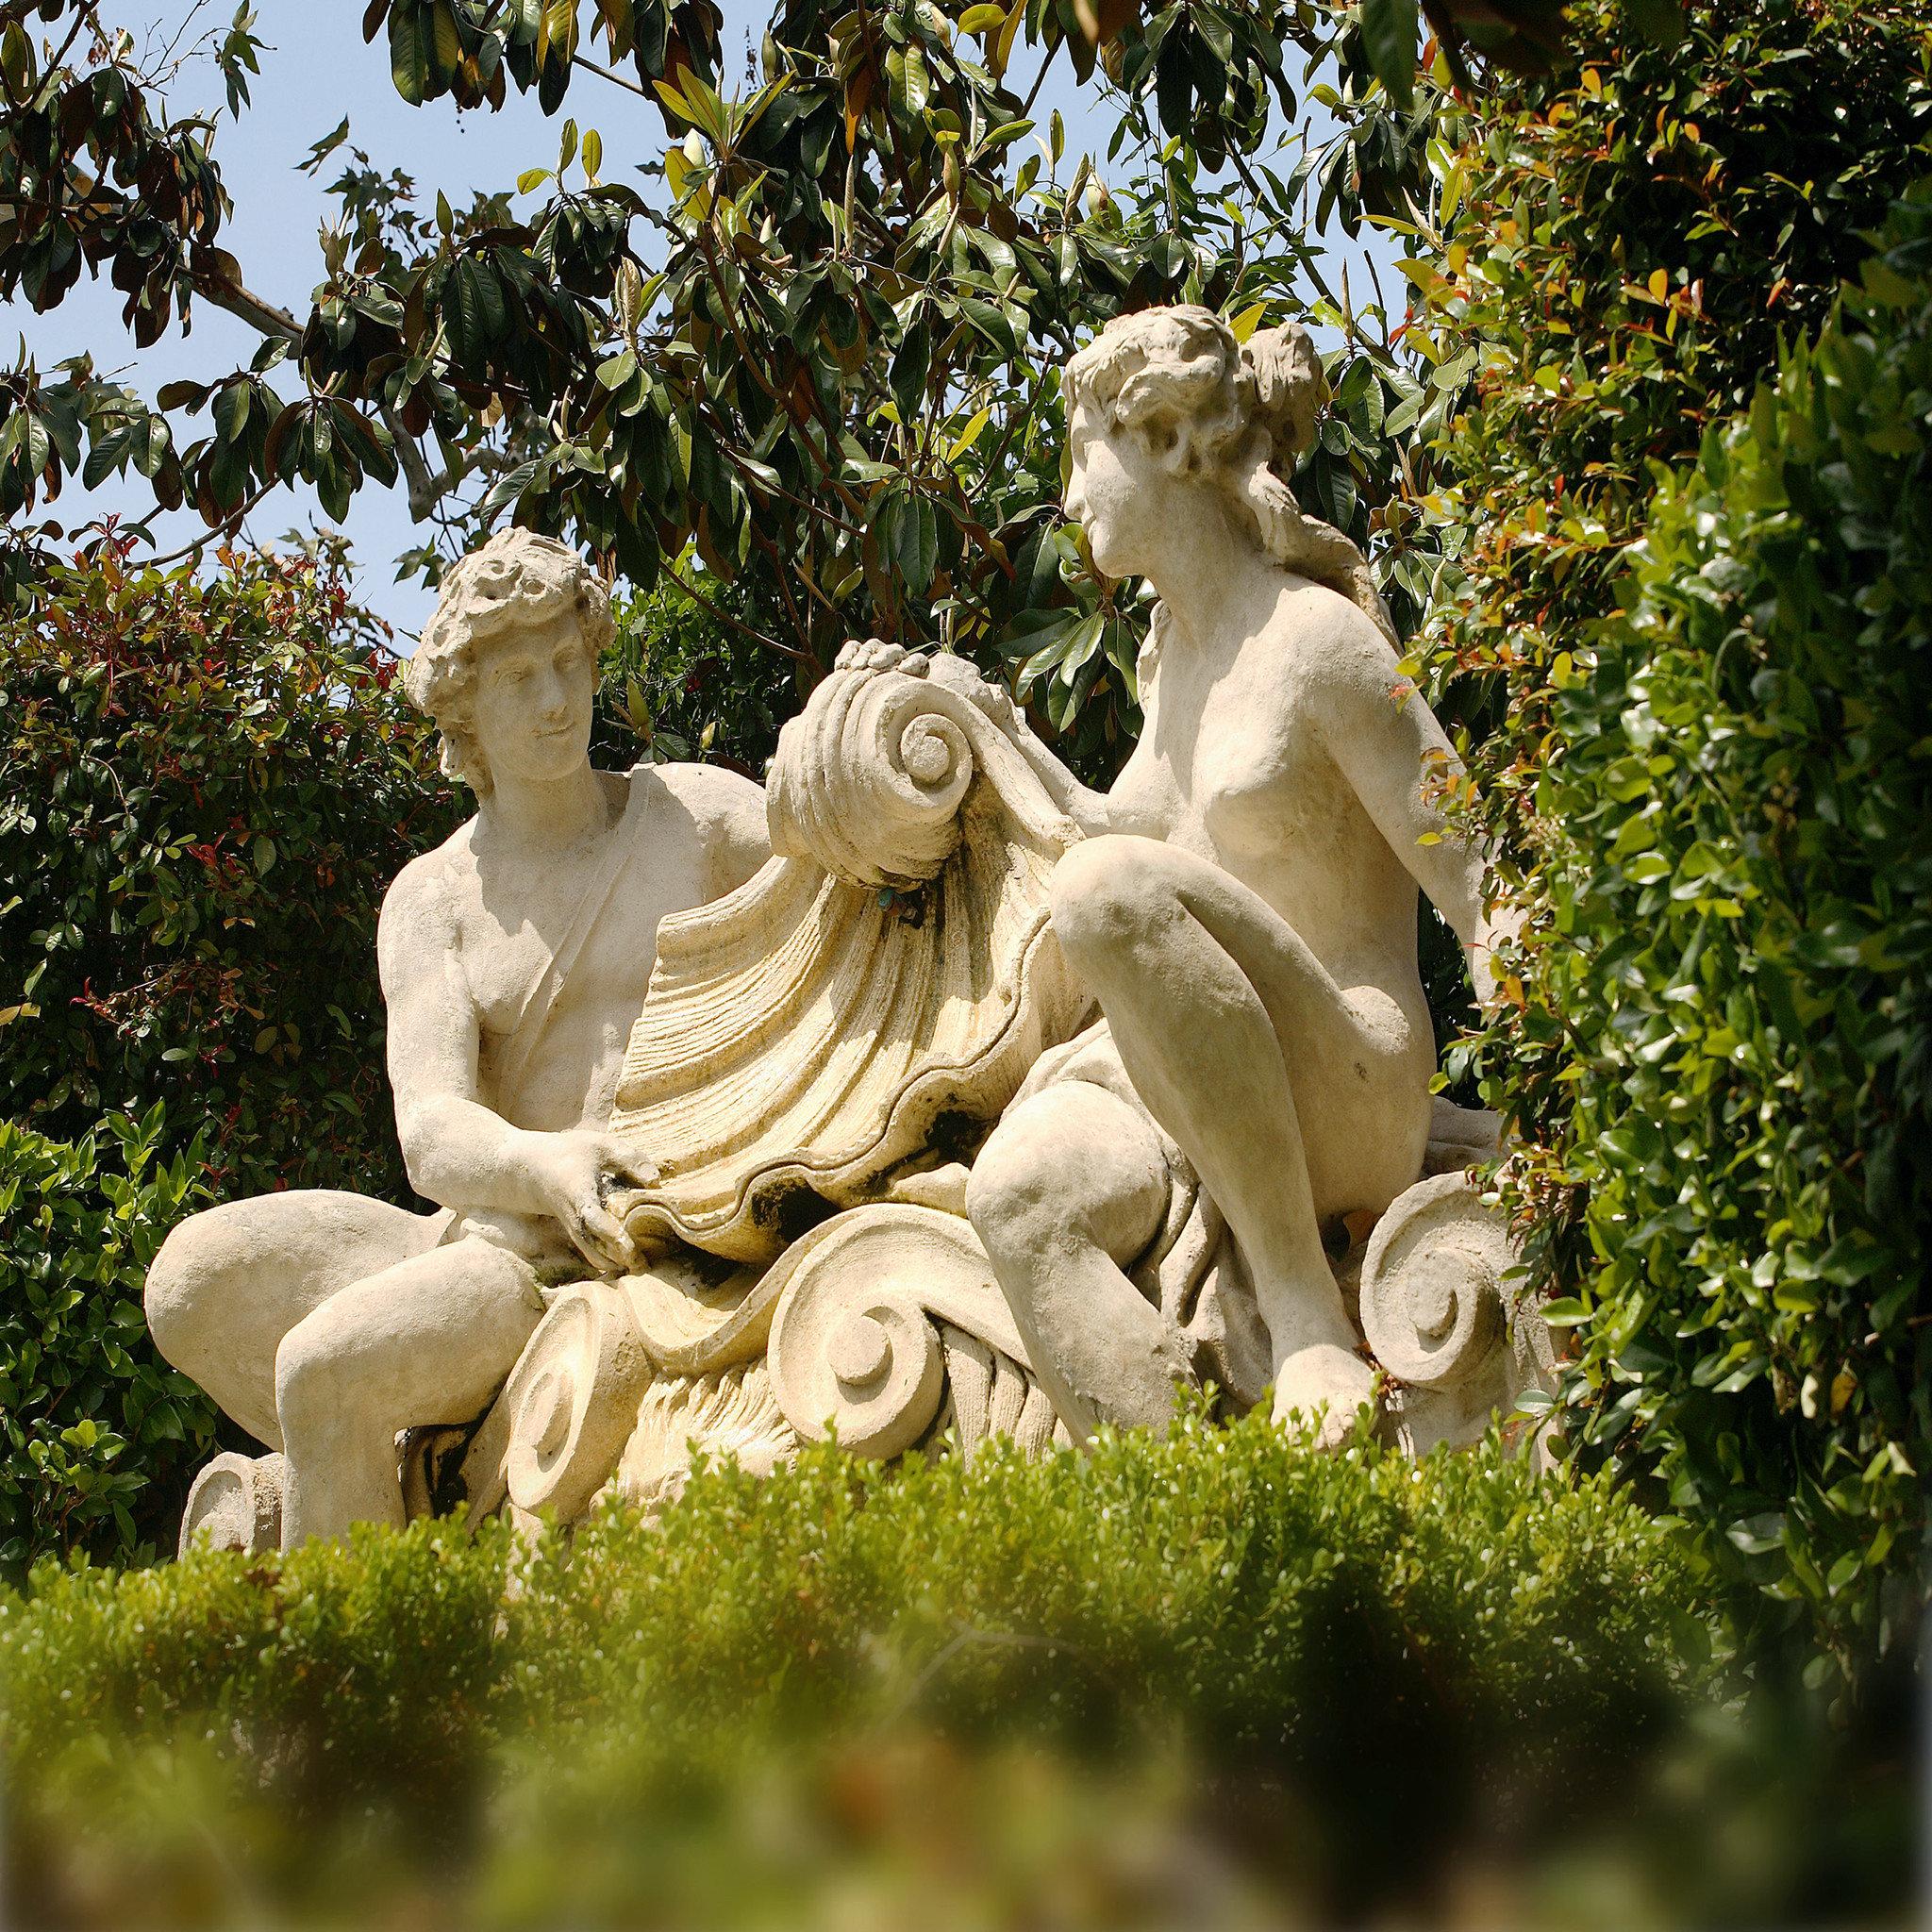 Hotels tree outdoor grass statue sculpture botany monument art Garden carving mythology flower